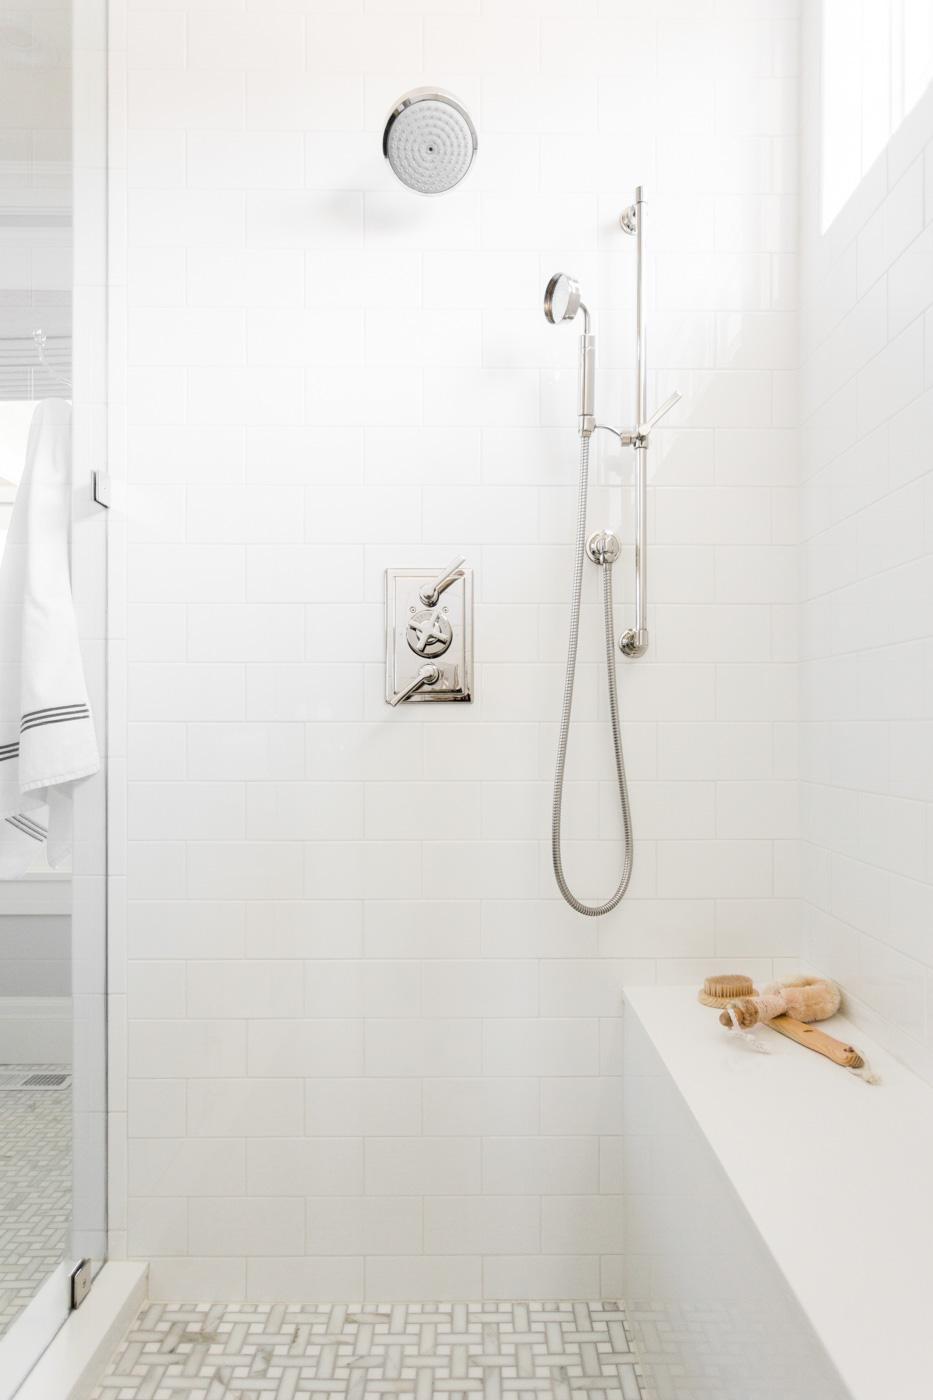 Shower+Details+__+Studio+McGee-1.jpg